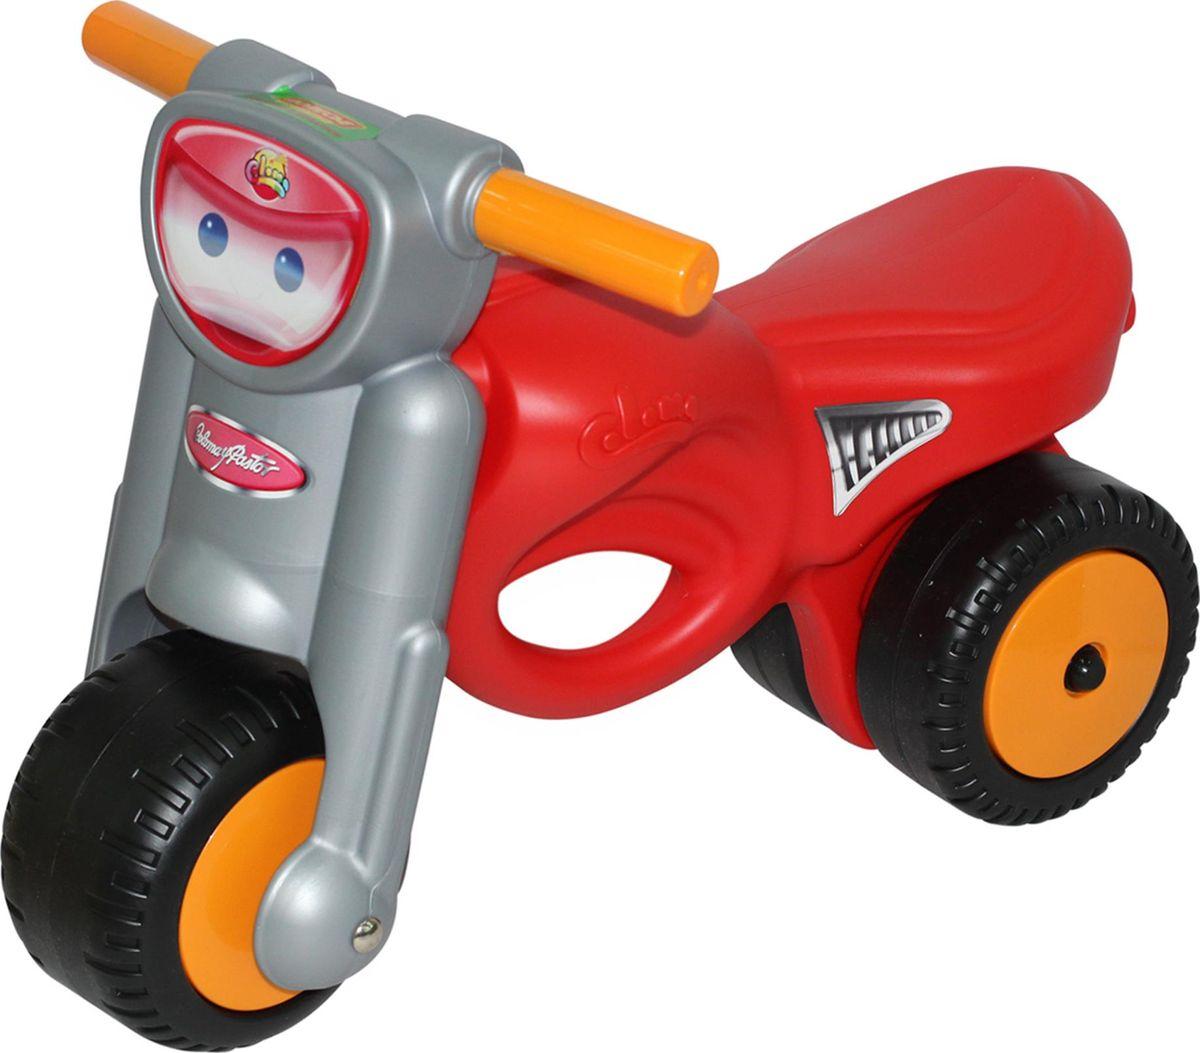 Полесье Каталка Мотоцикл Мини-мото каталка детская полесье полесье каталка мотоцикл мх